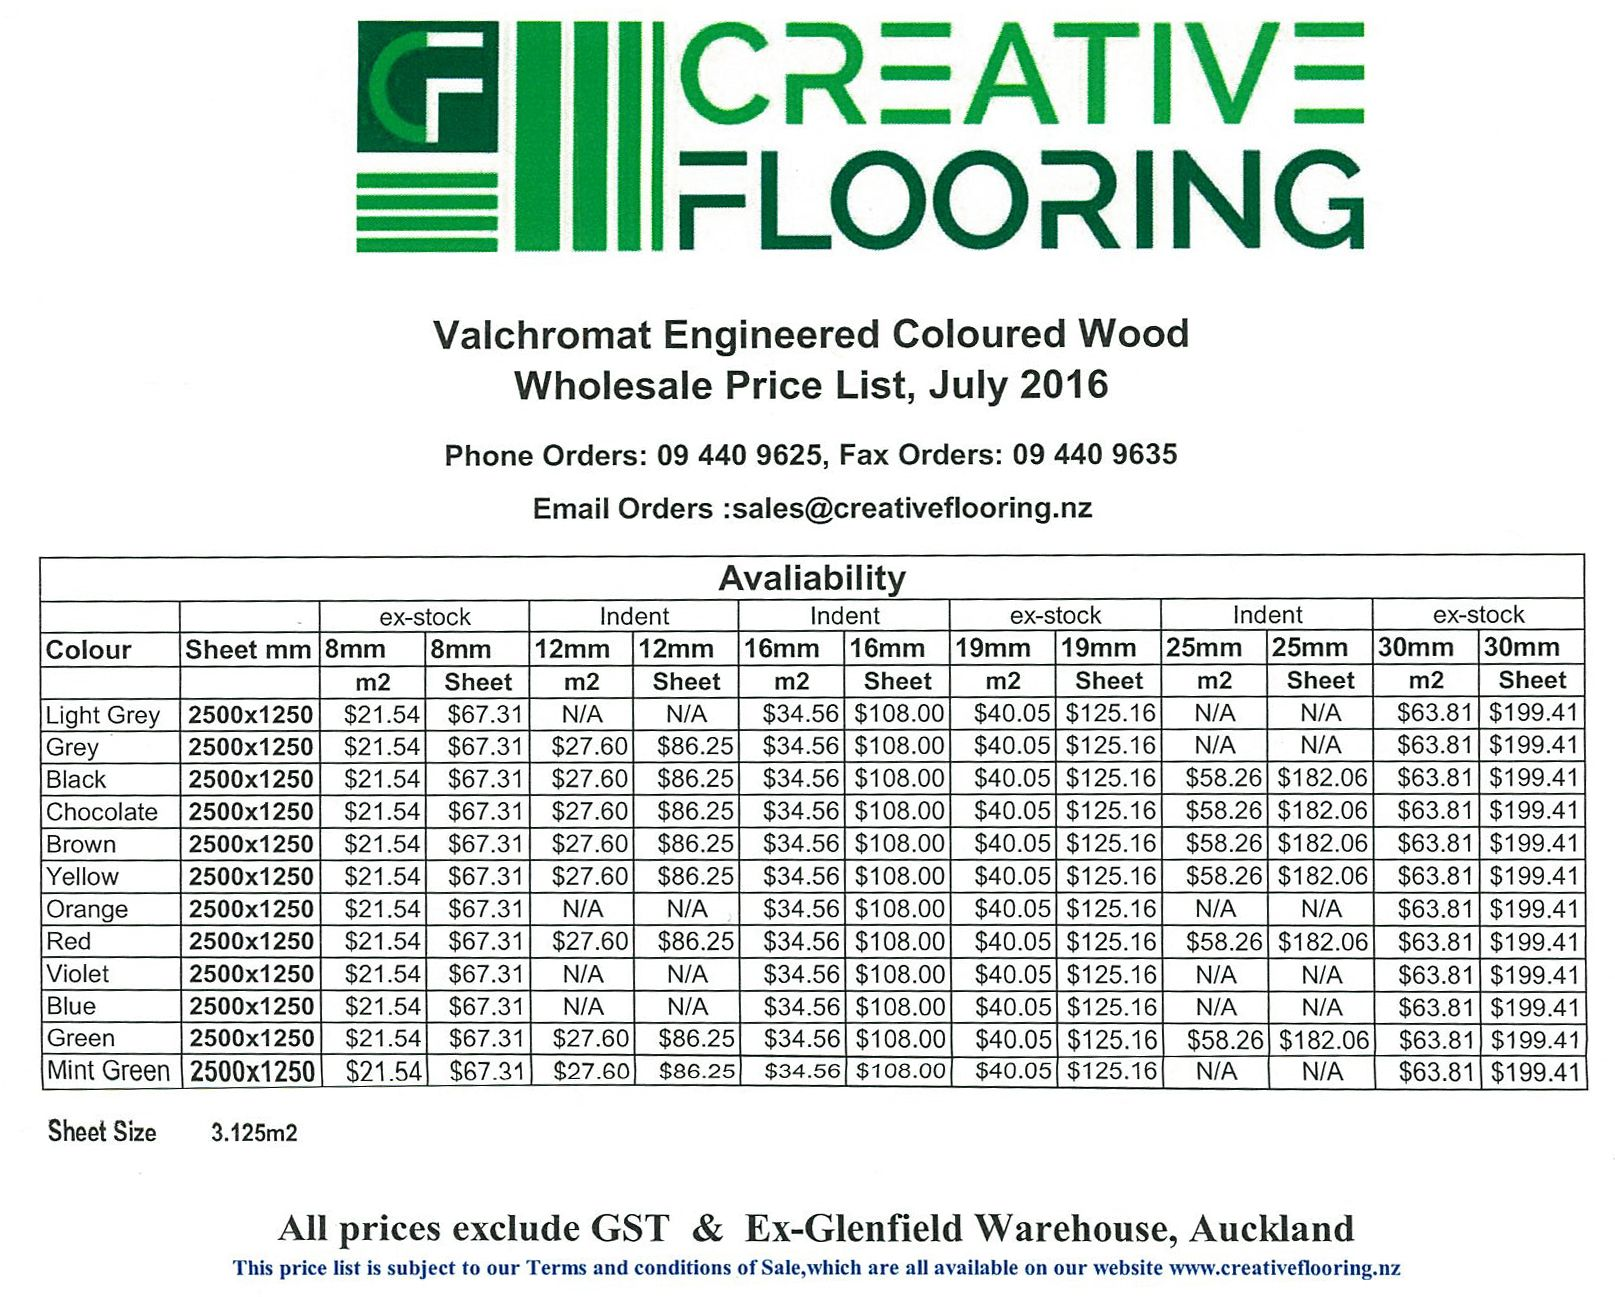 Valchromat Price List And Contact Valchromat Creative Flooring Phone Orders